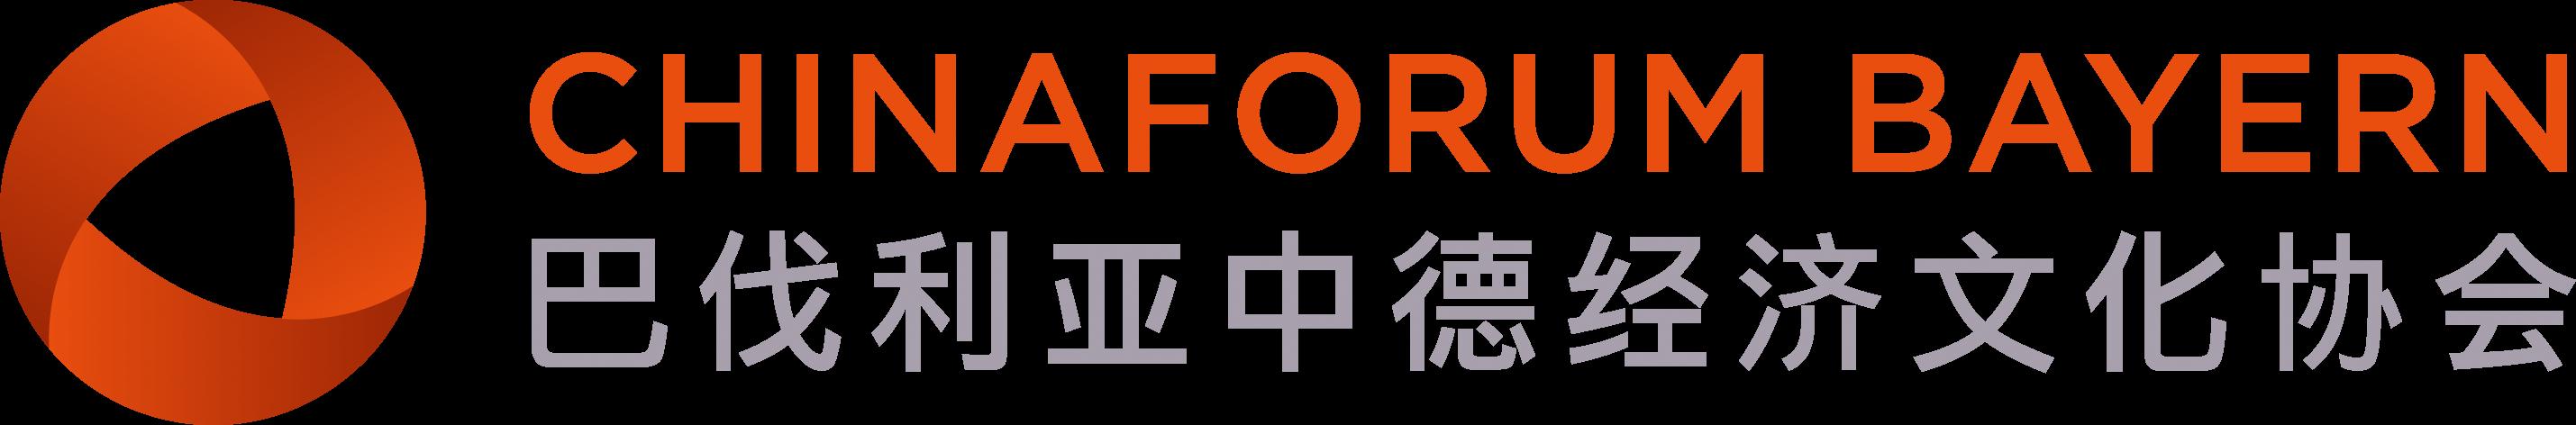 Chinaforum Logo